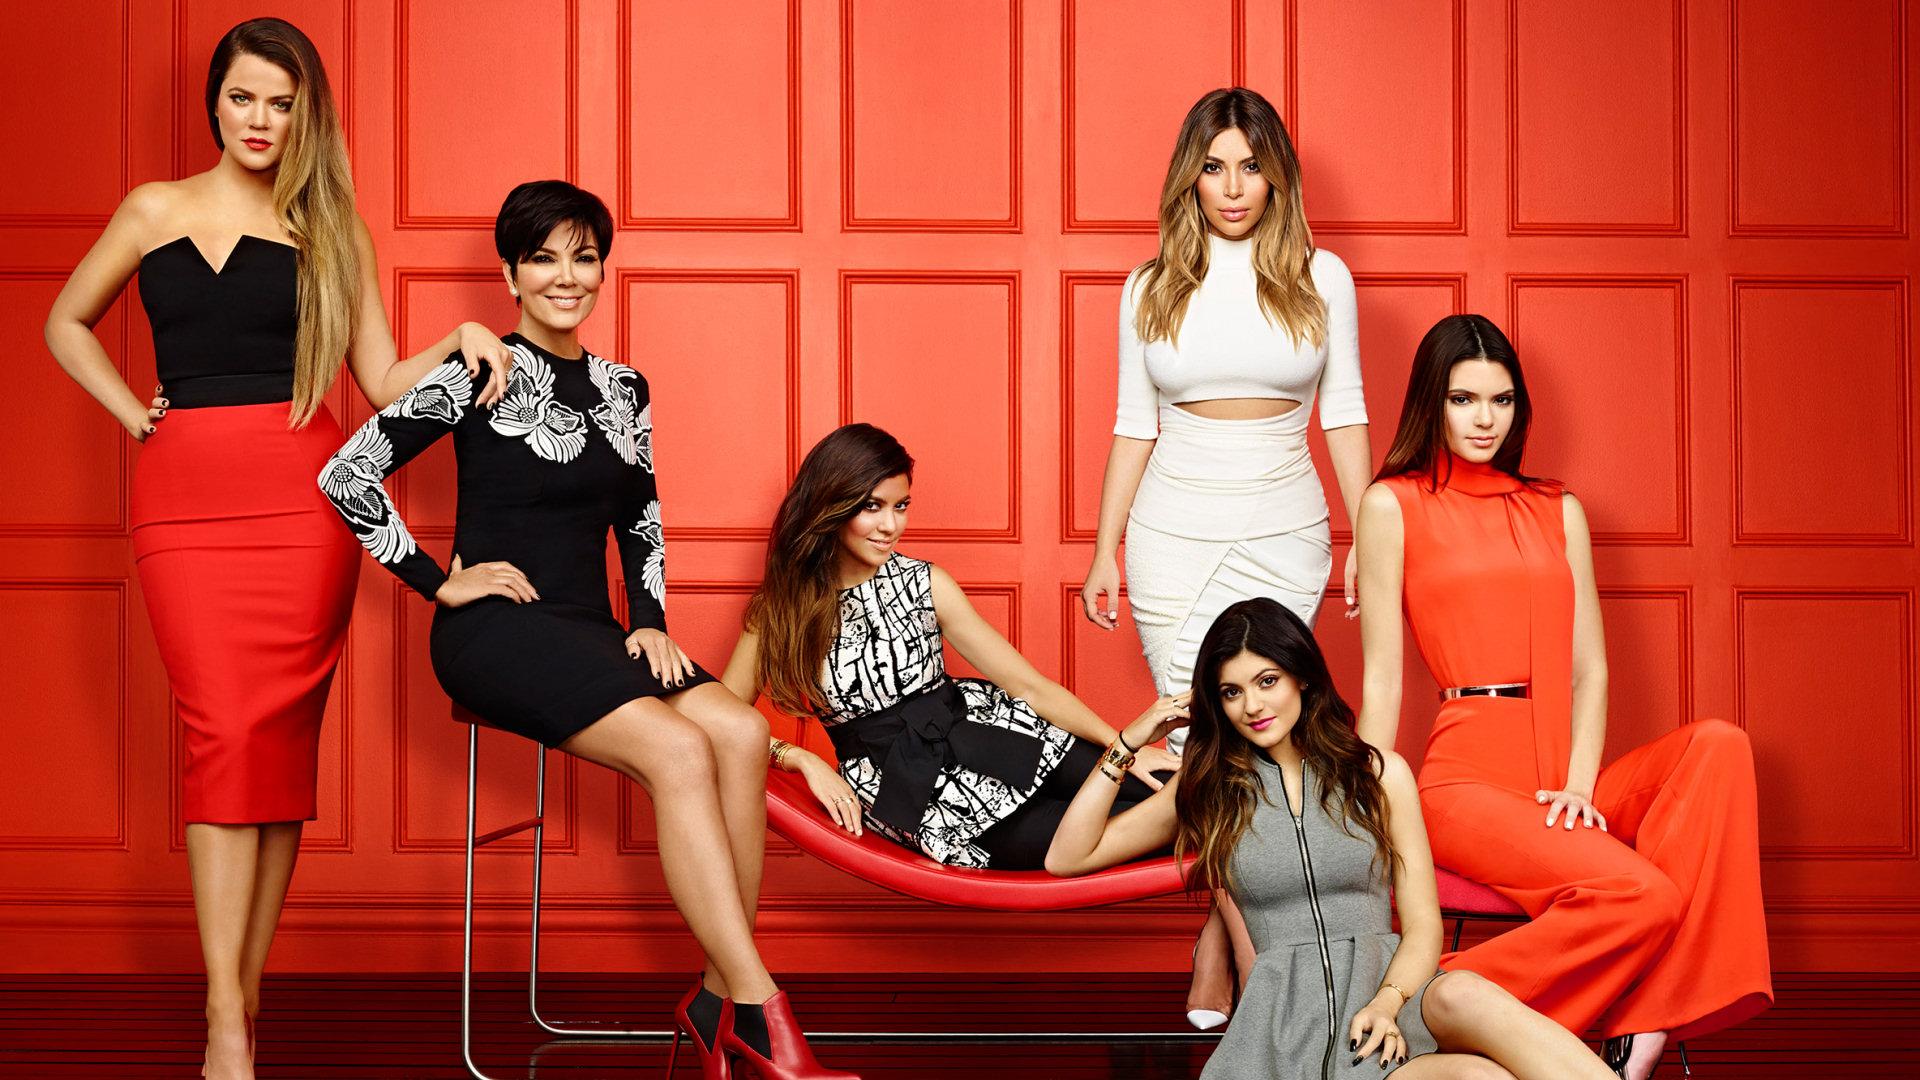 Bish-Where-Cosmopolitan-Names-The-Kardashians-wallpaper-wp3403260